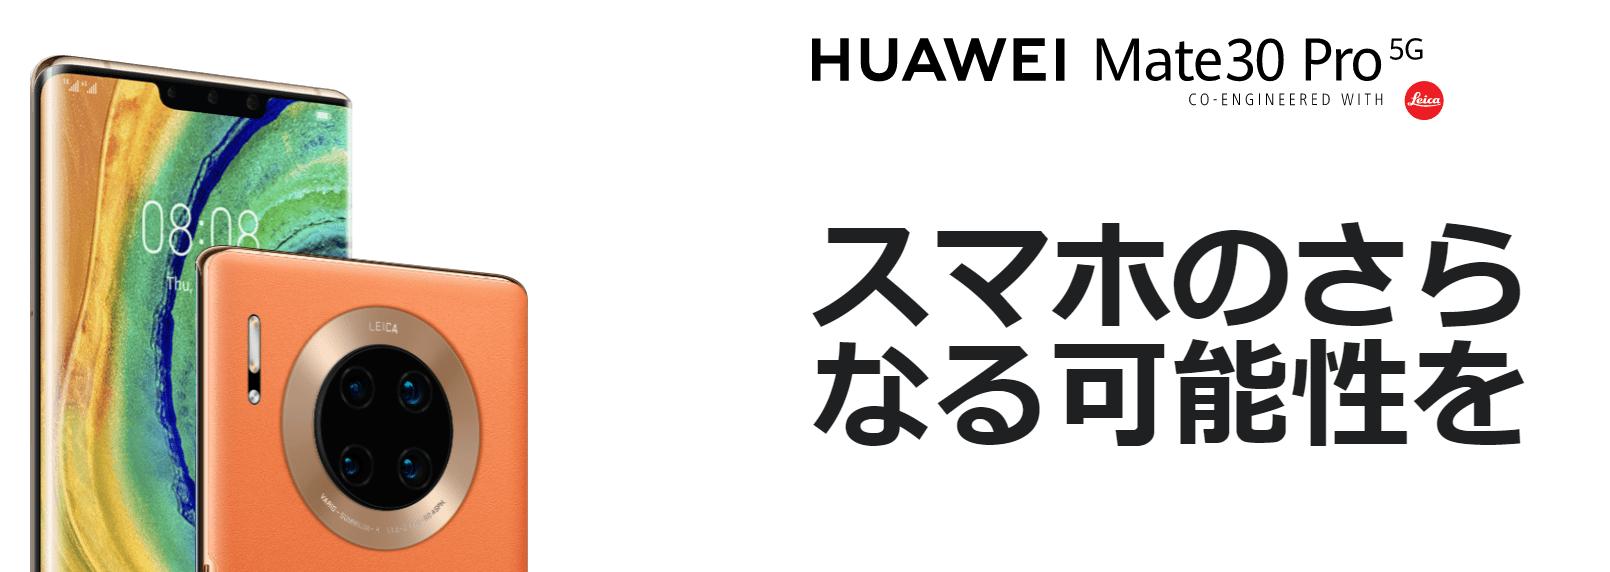 Huawei EMUIセキュリティパッチの更新に対応した製品一覧